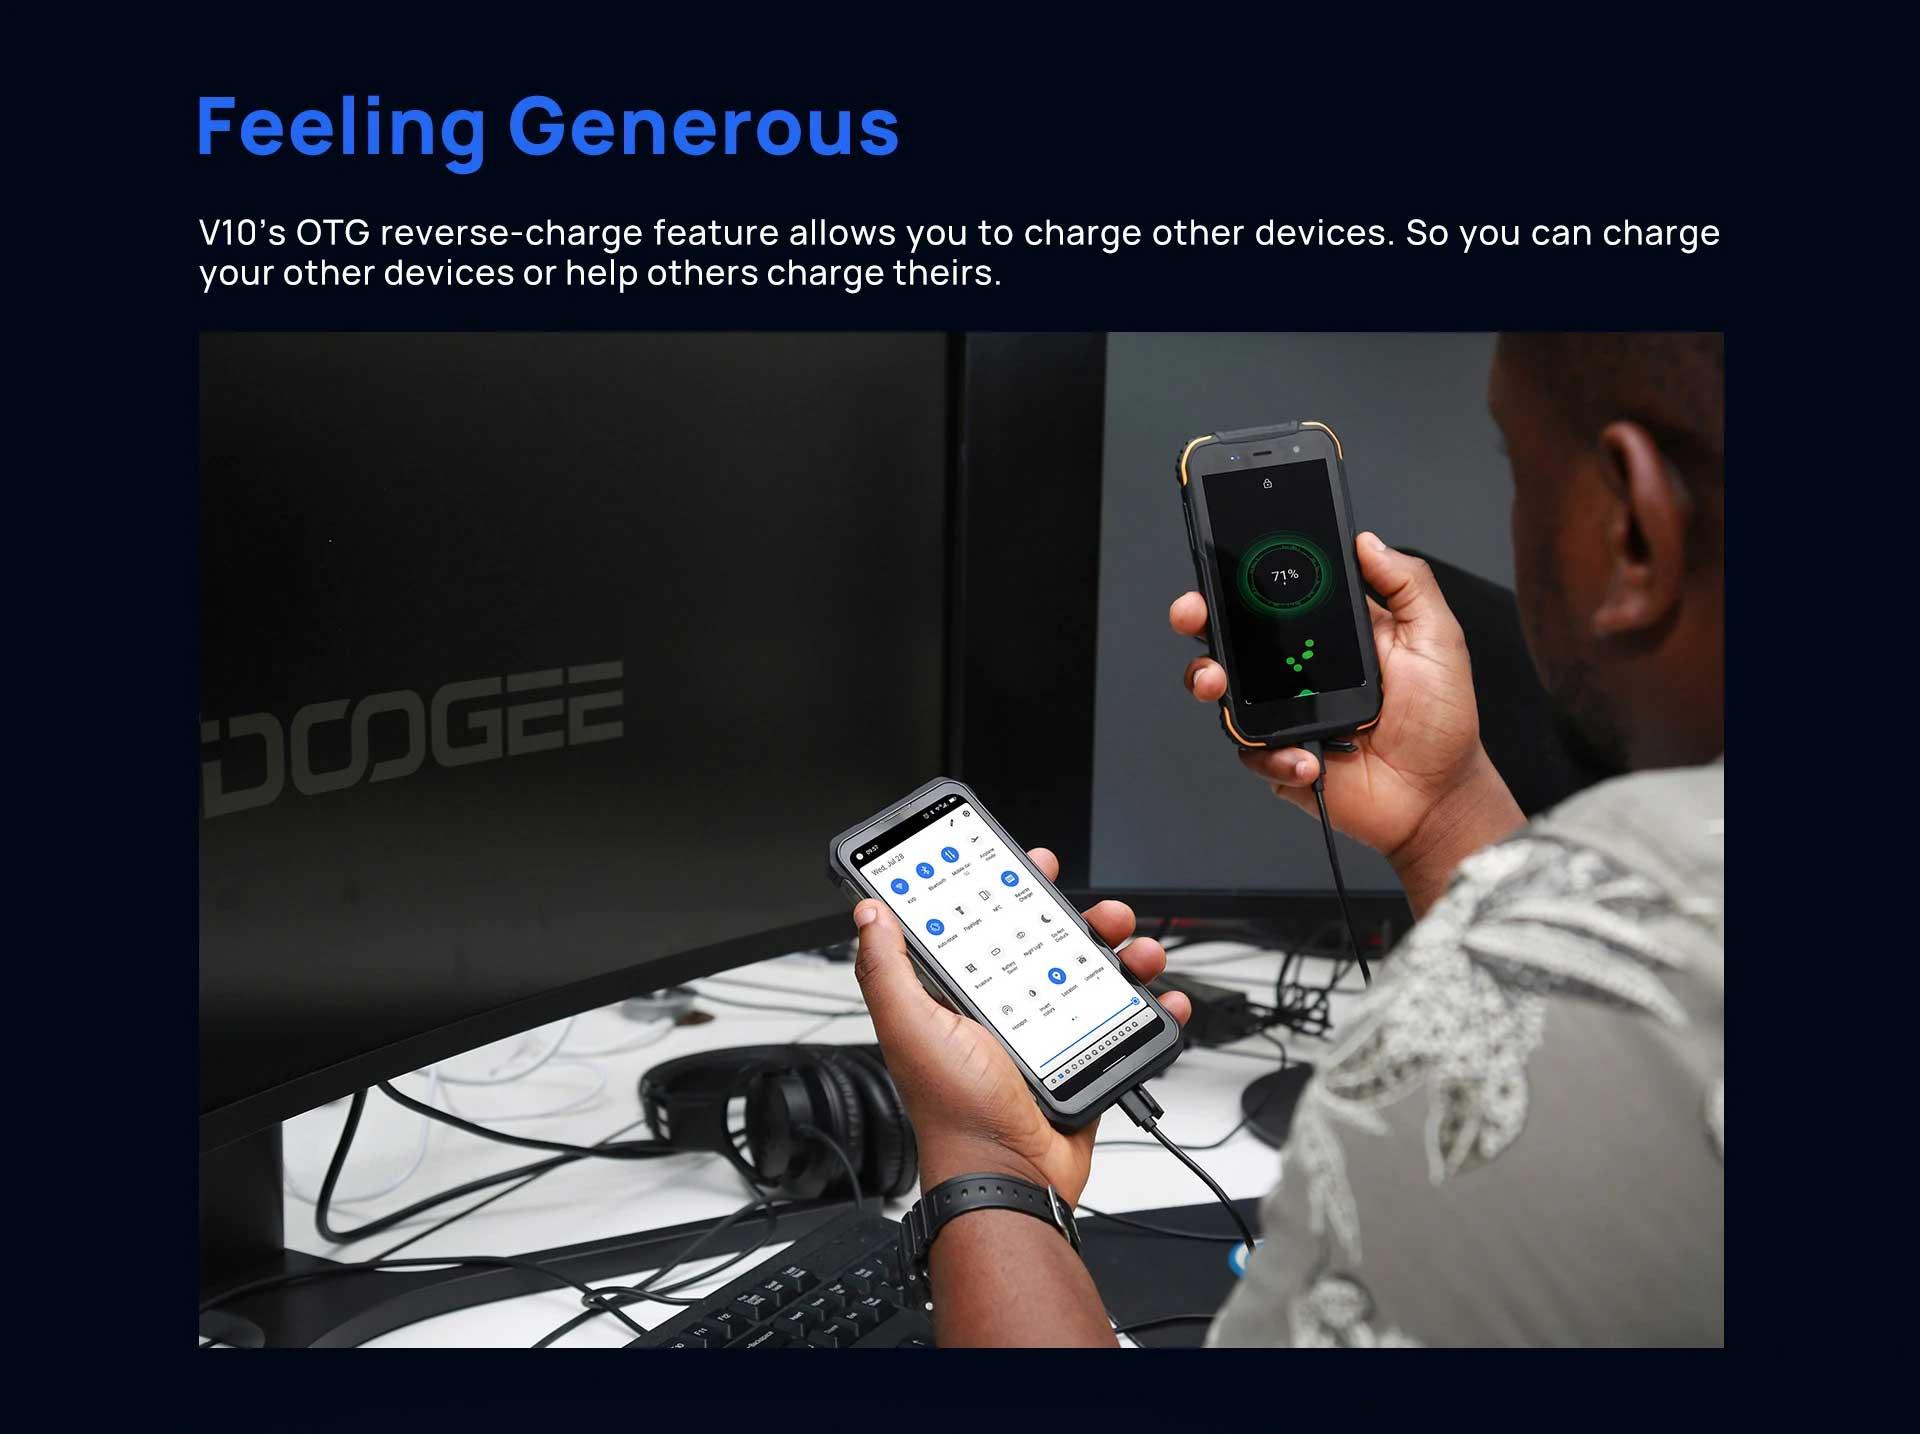 Doogee V10 5G price